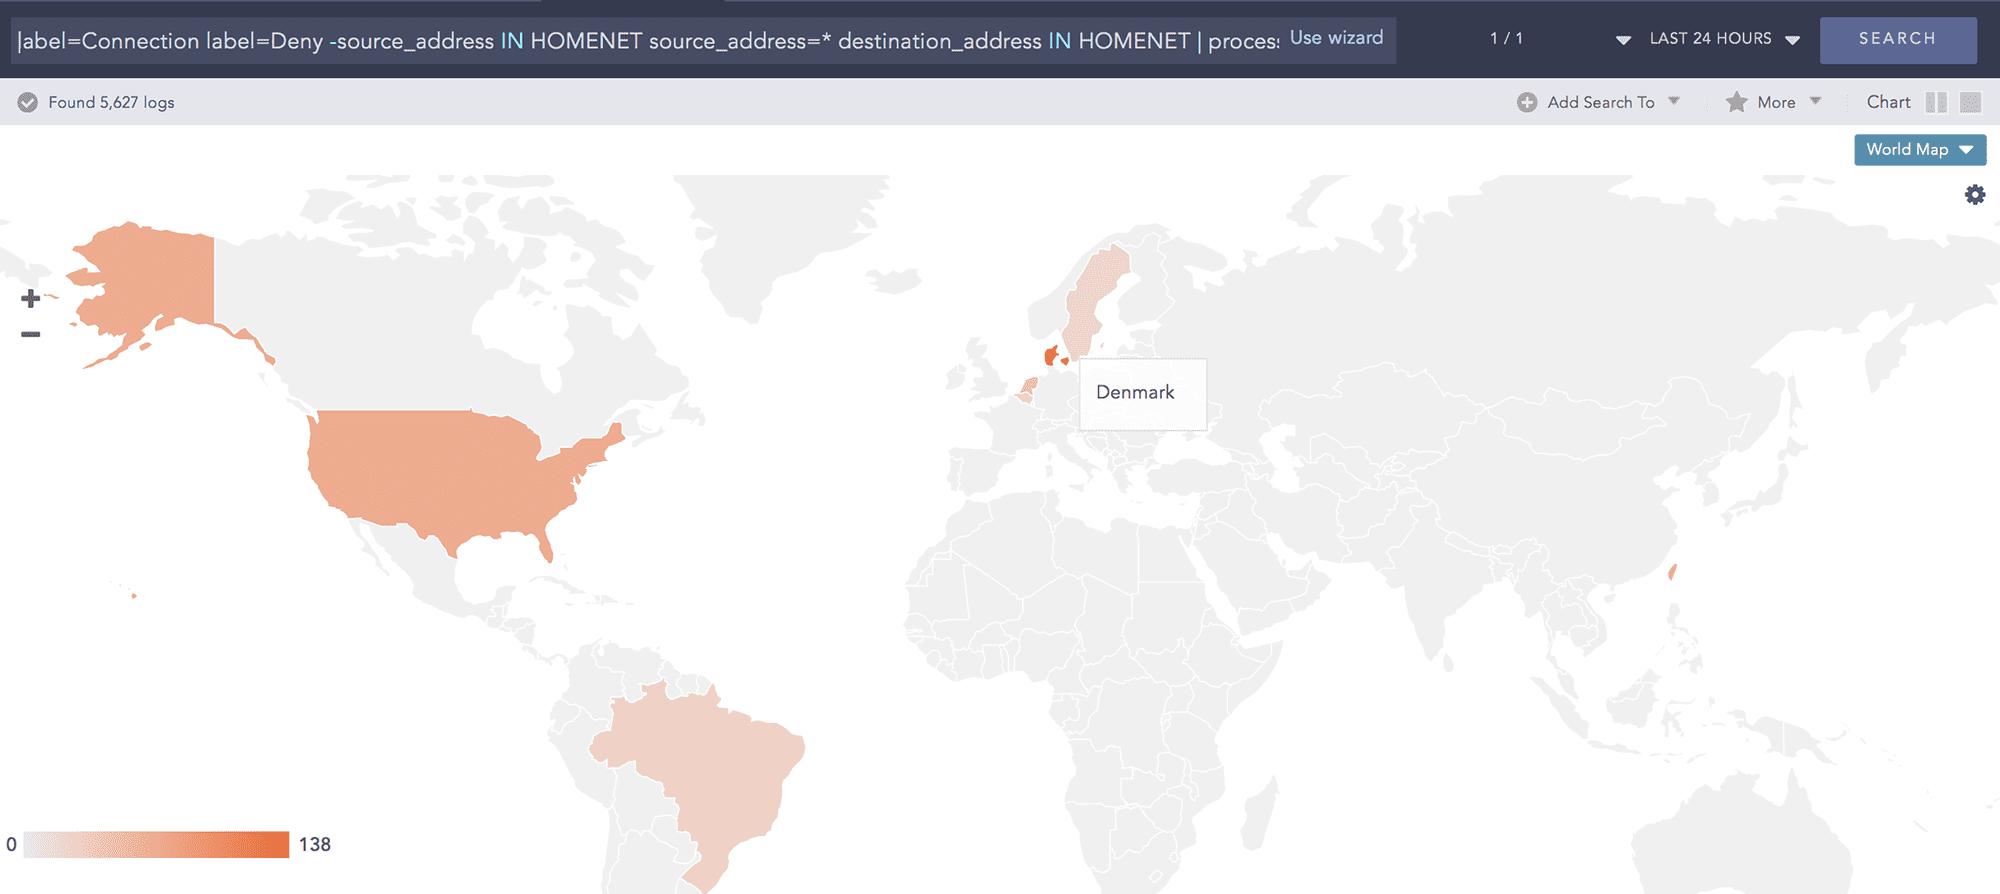 LogPoint SIEM Top 10 Denied Inbound Connection by Location